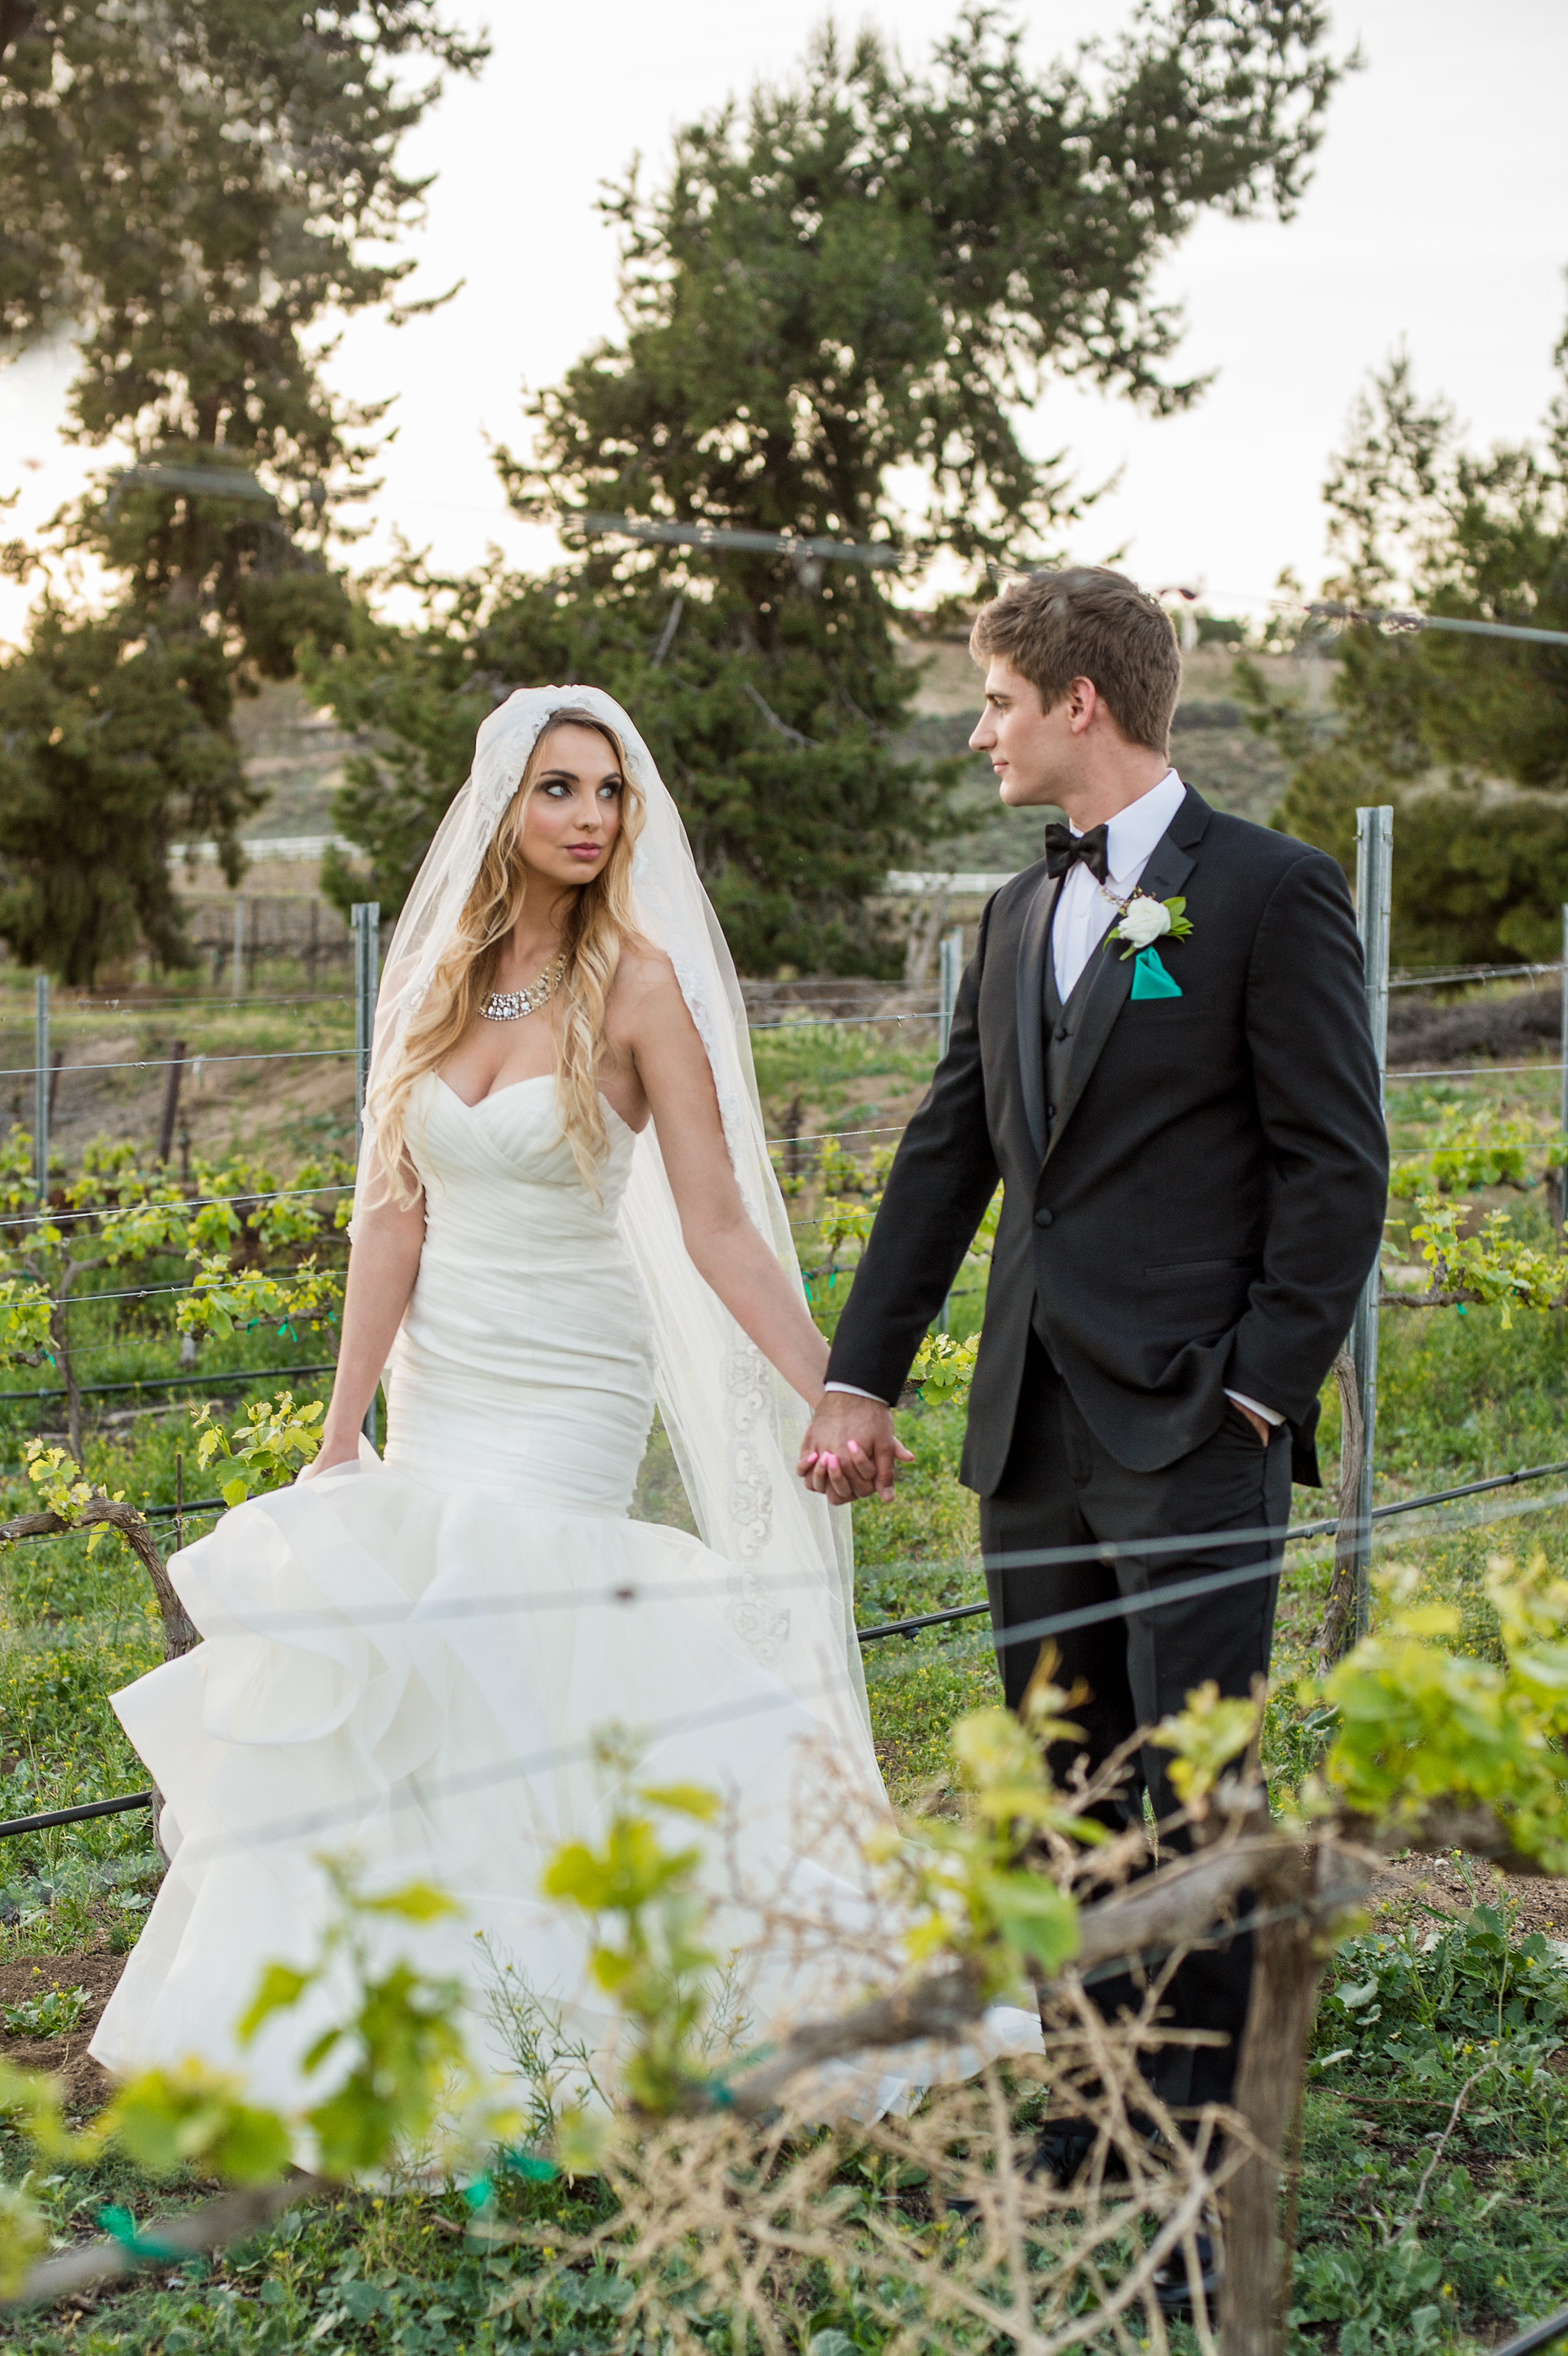 Temecula Wedding Hair and Makeup | Temecula Winery Wedding | Fazeli Cellars Wedding